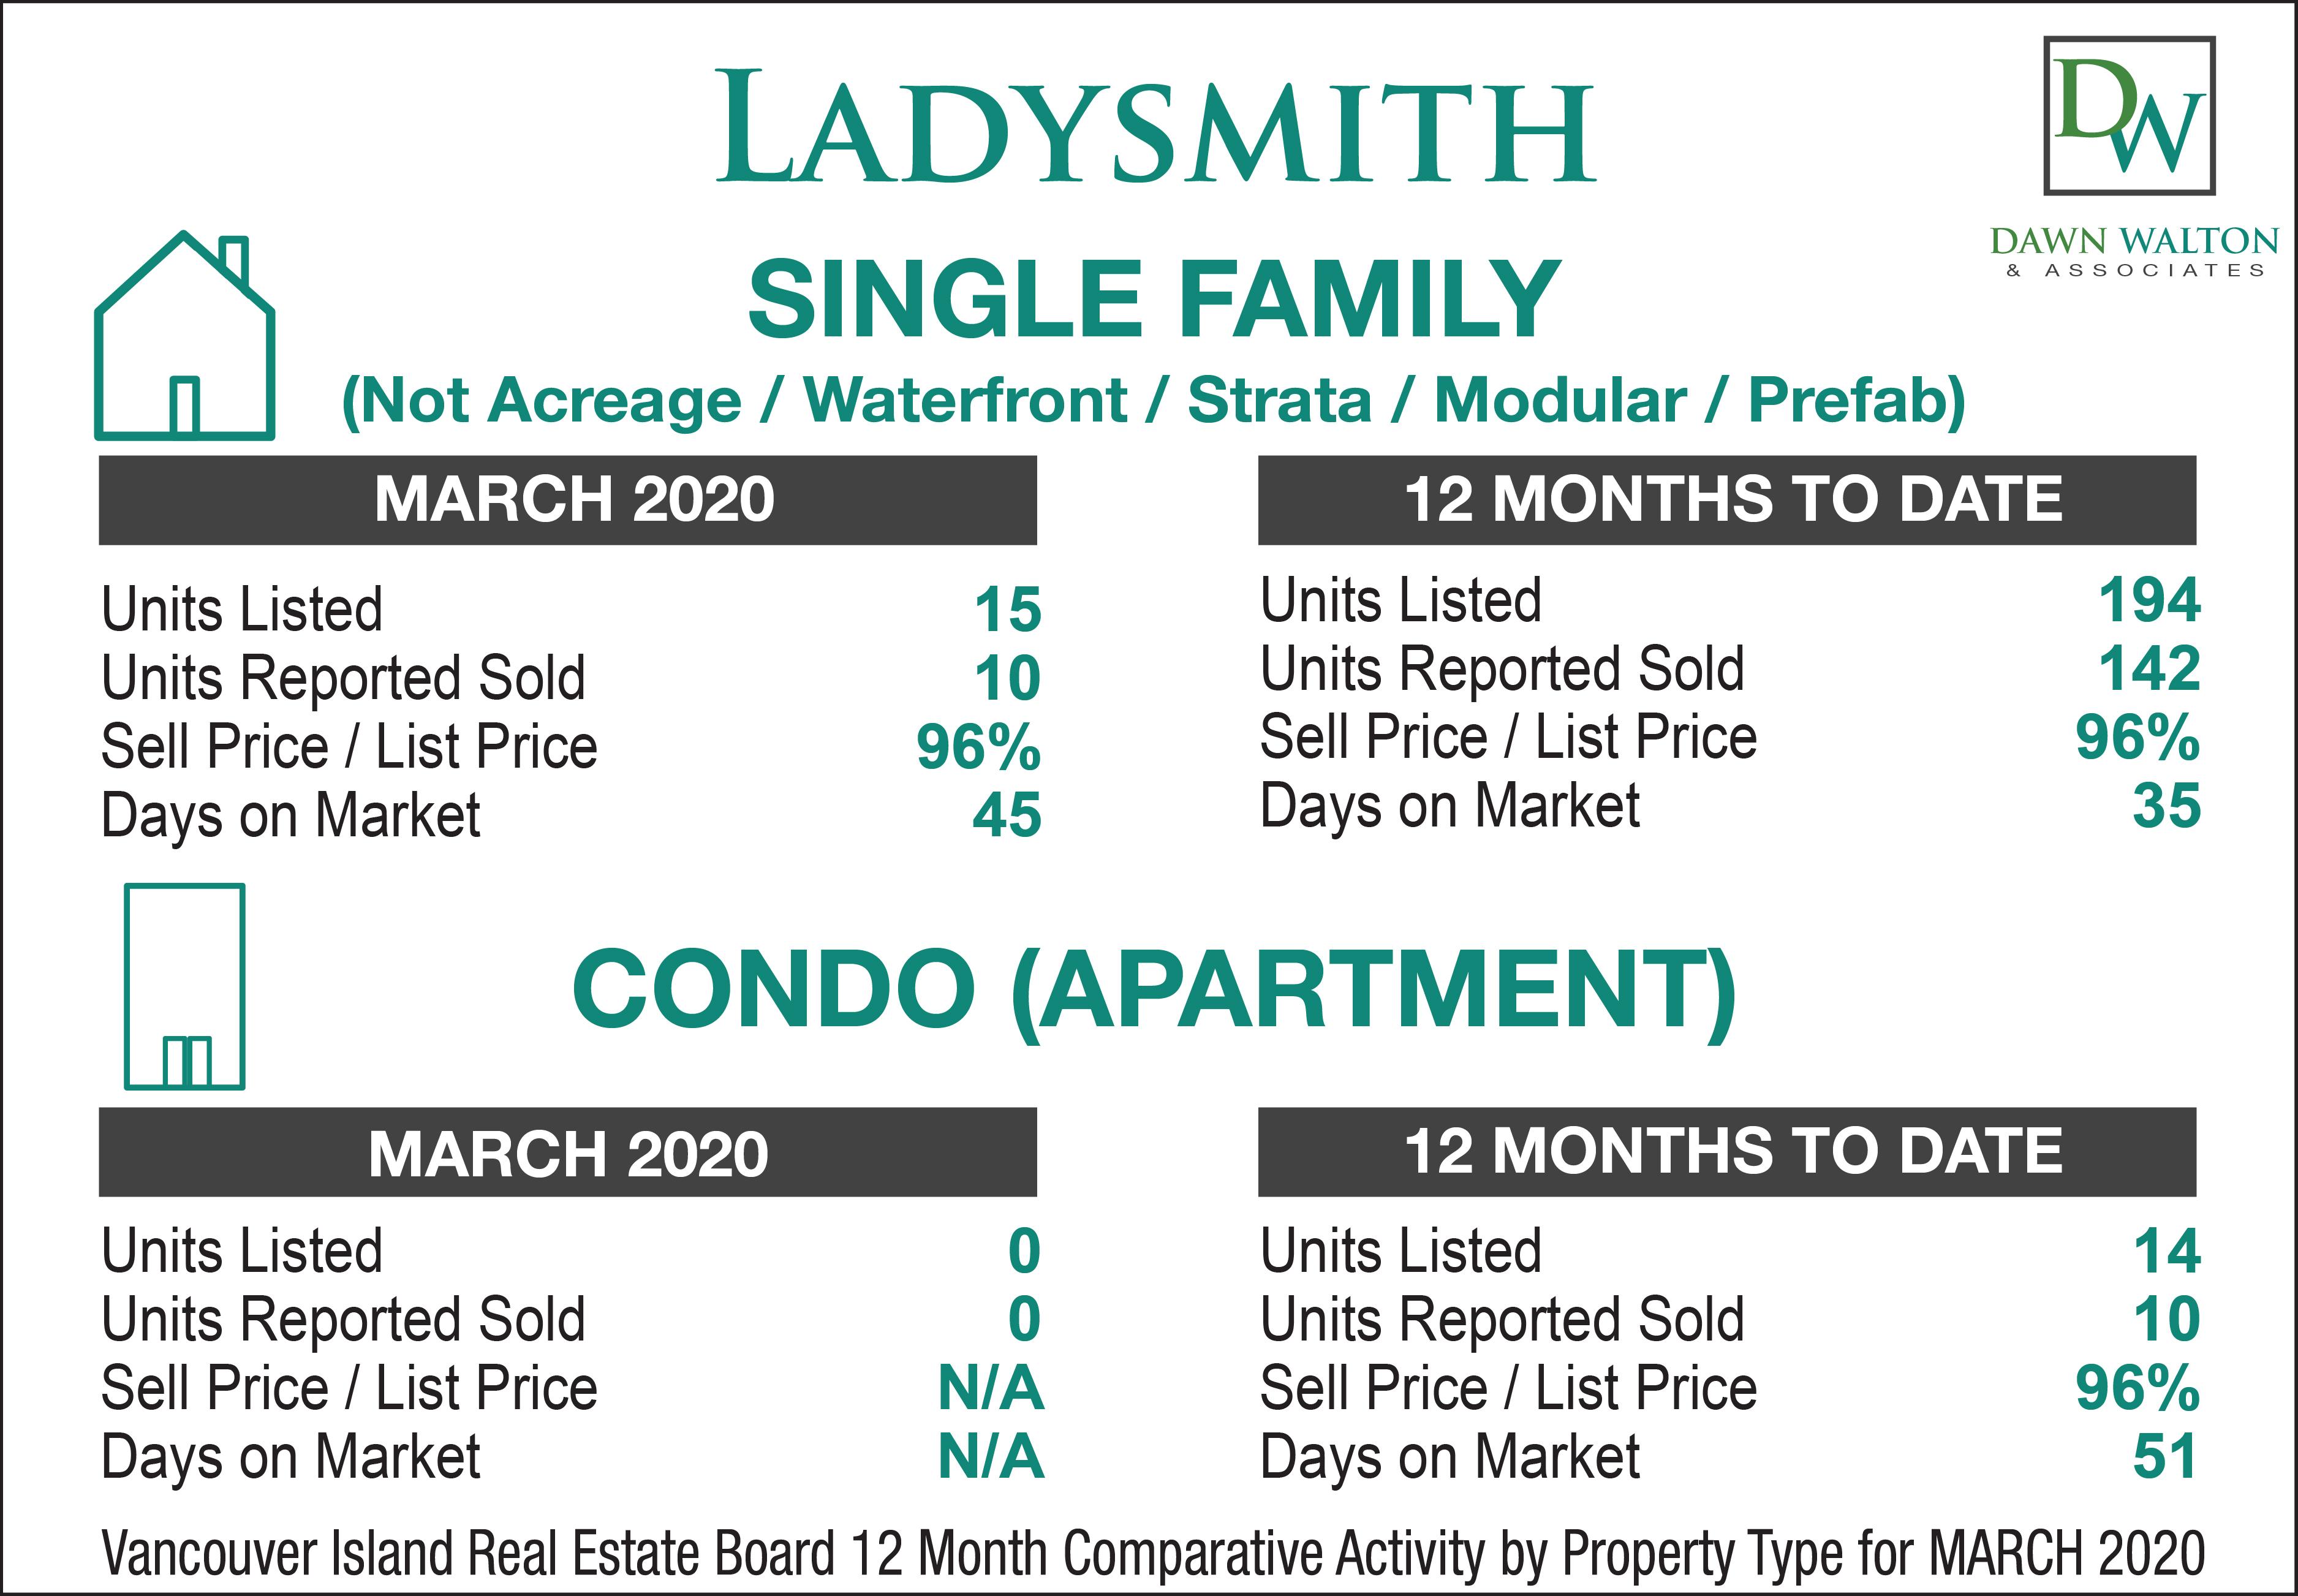 Ladysmith Real Estate Market Stats March 2020 - Nanaimo Realtor Dawn Walton